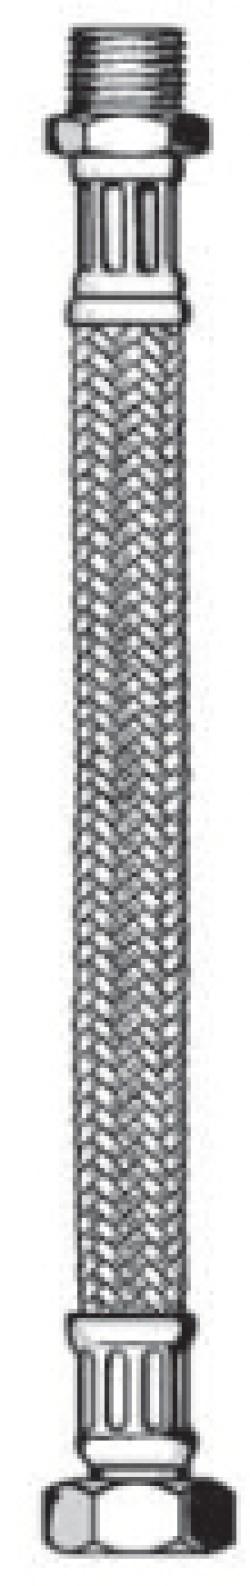 МЕ 5625.1127.50 Meiflex Dn18, 3/4 BPx3/4HP, 500mm